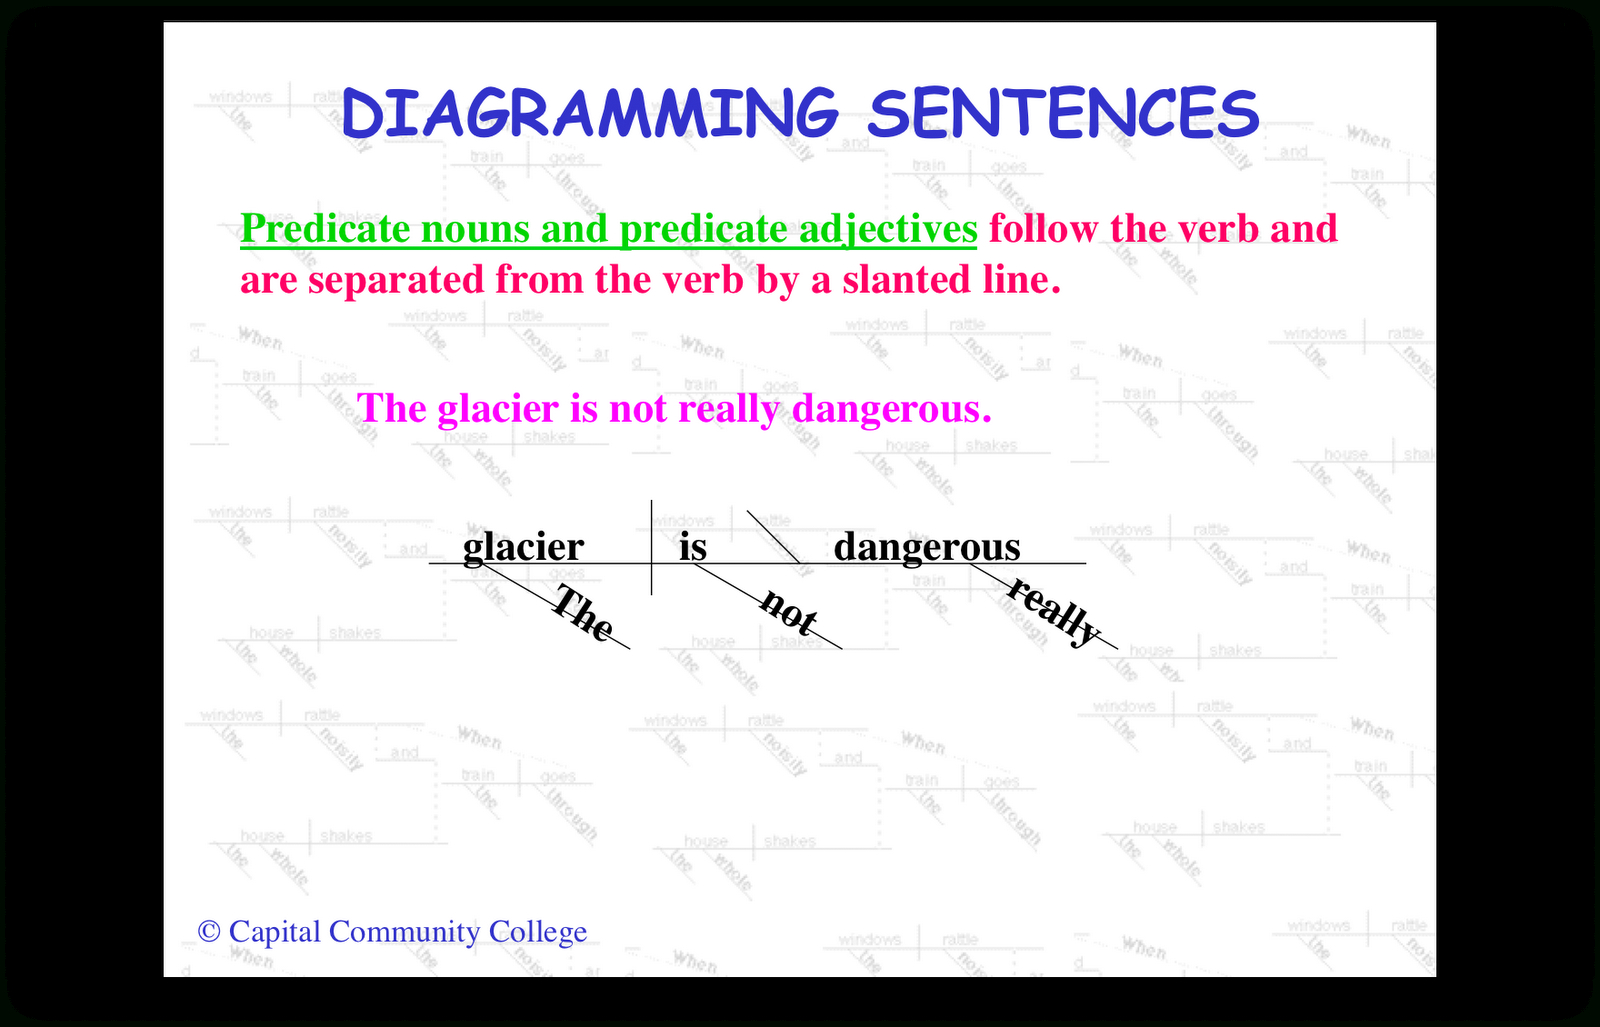 4Th Grade Grammar Worksheets & Free Printables | Monpetitlangage.ml - Free Printable Sentence Diagramming Worksheets